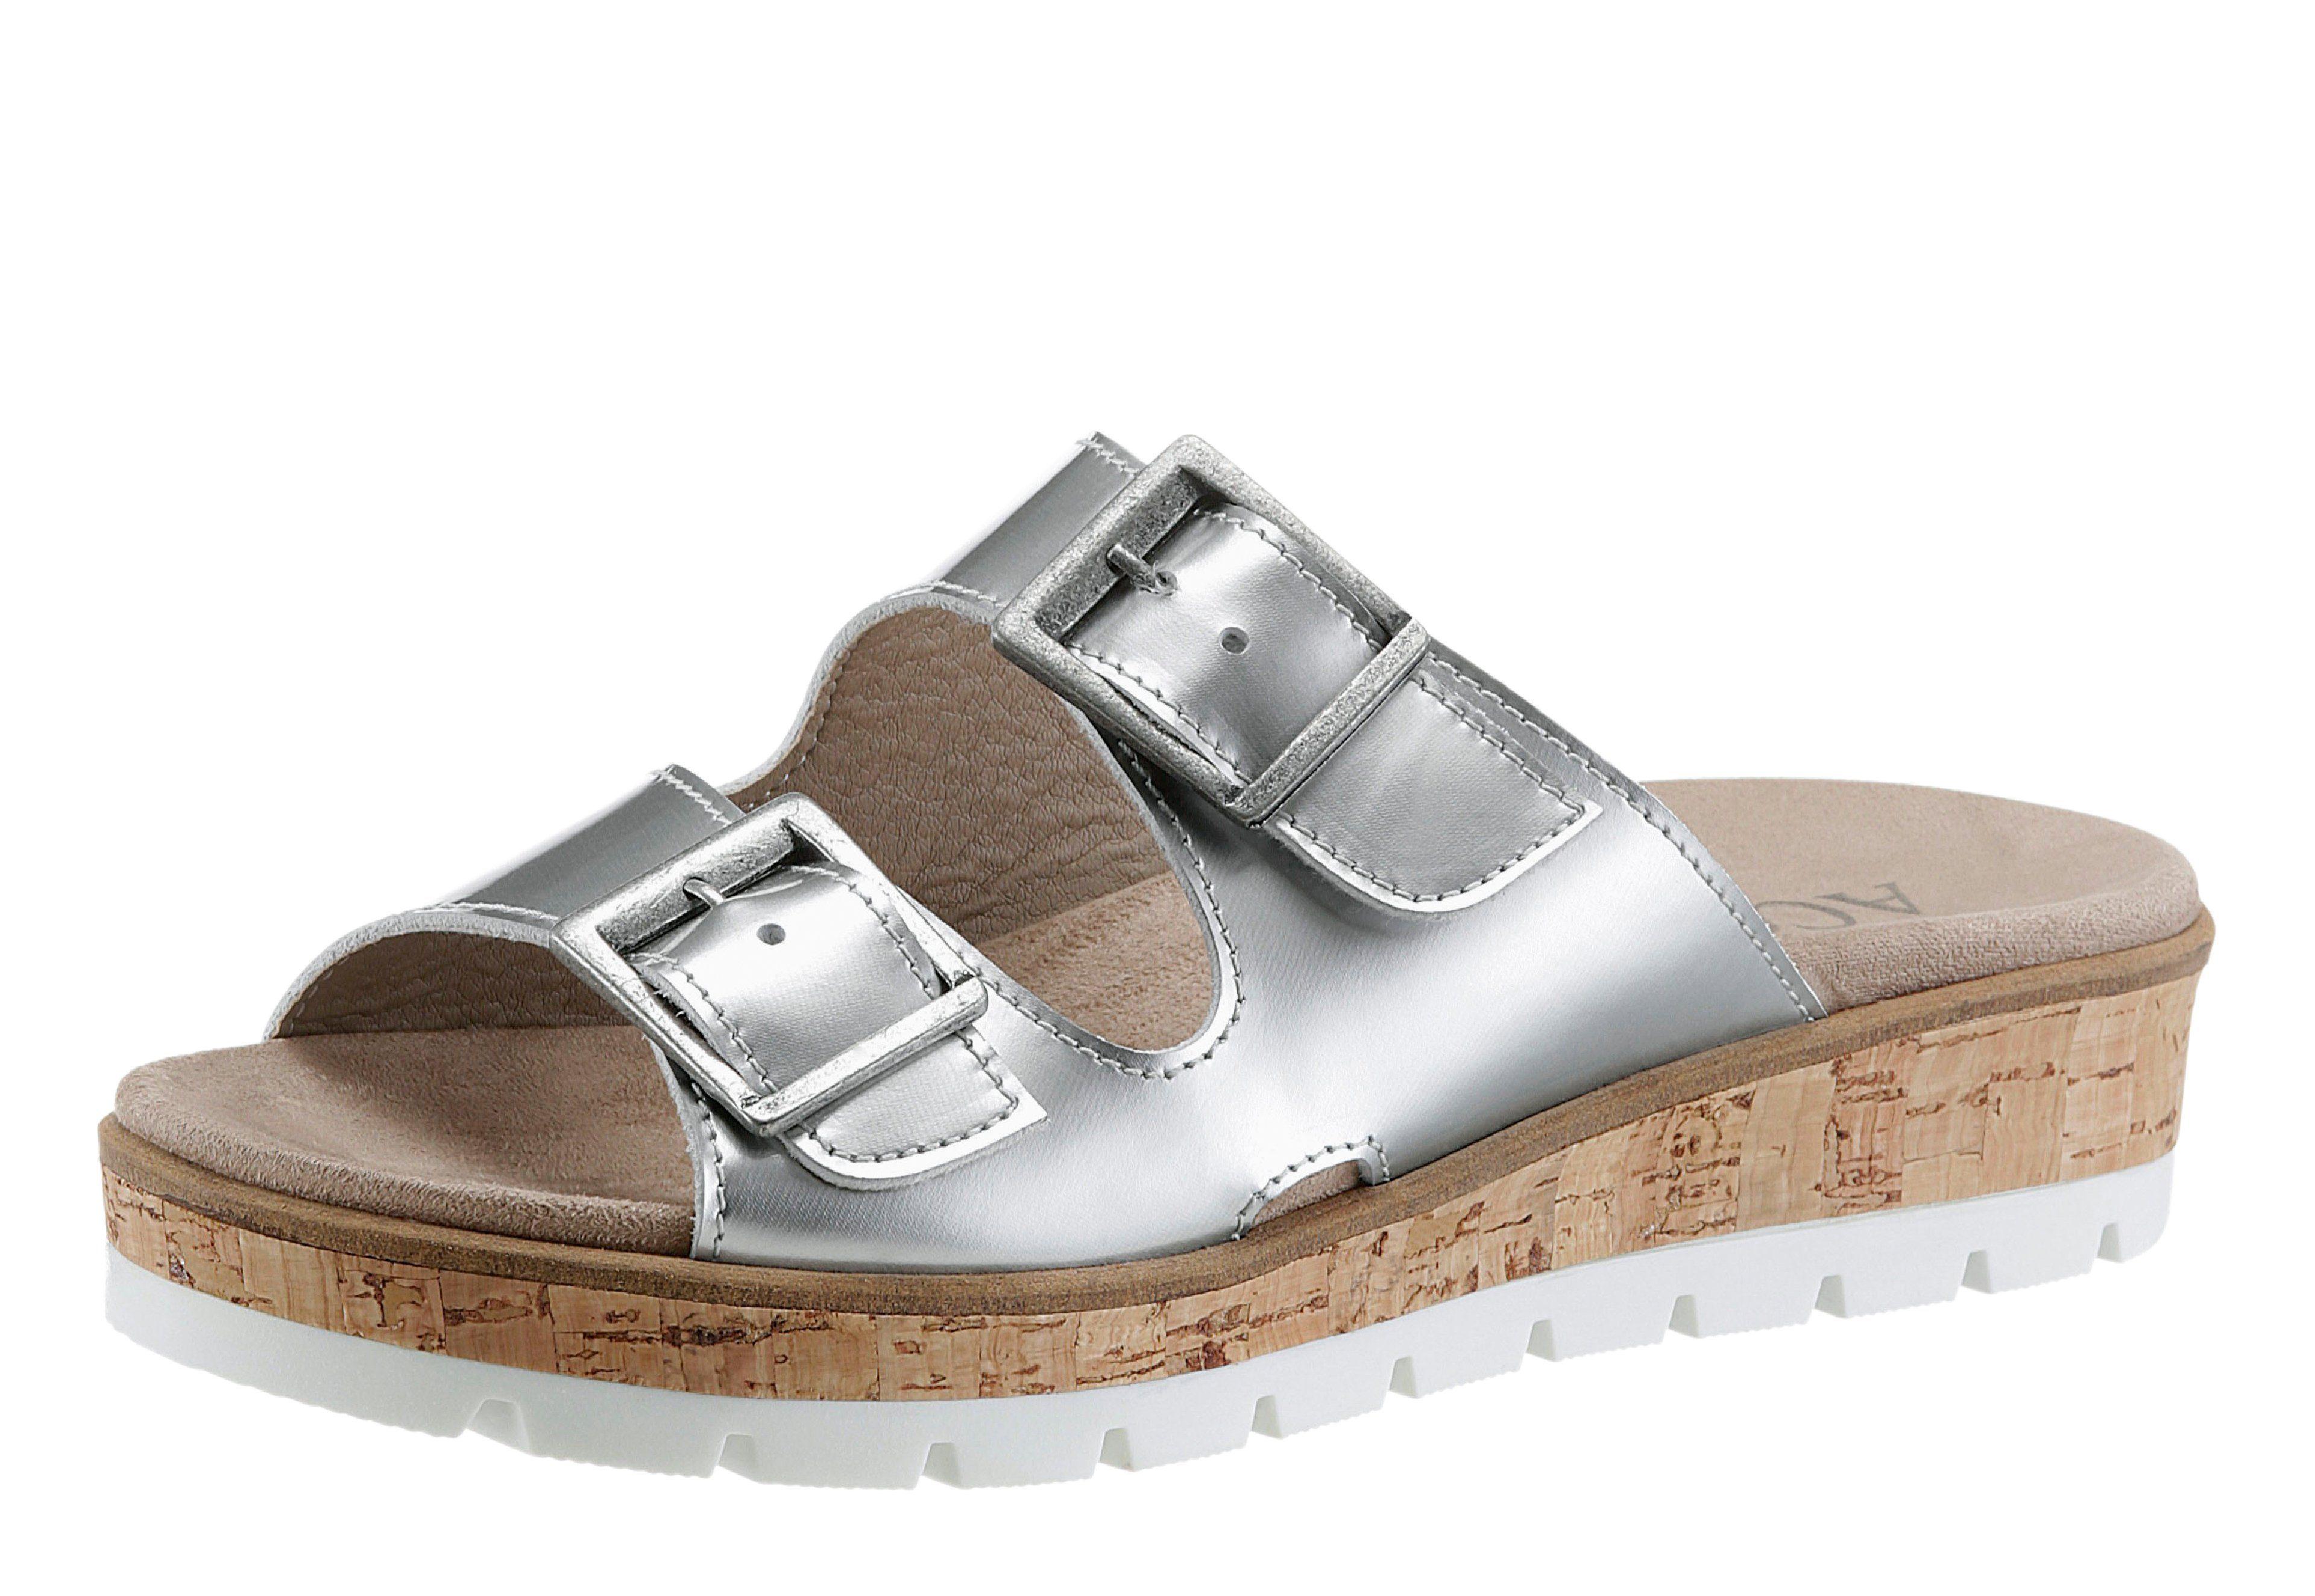 Corkies Damen Pantolette metallics ErebK8ccLG